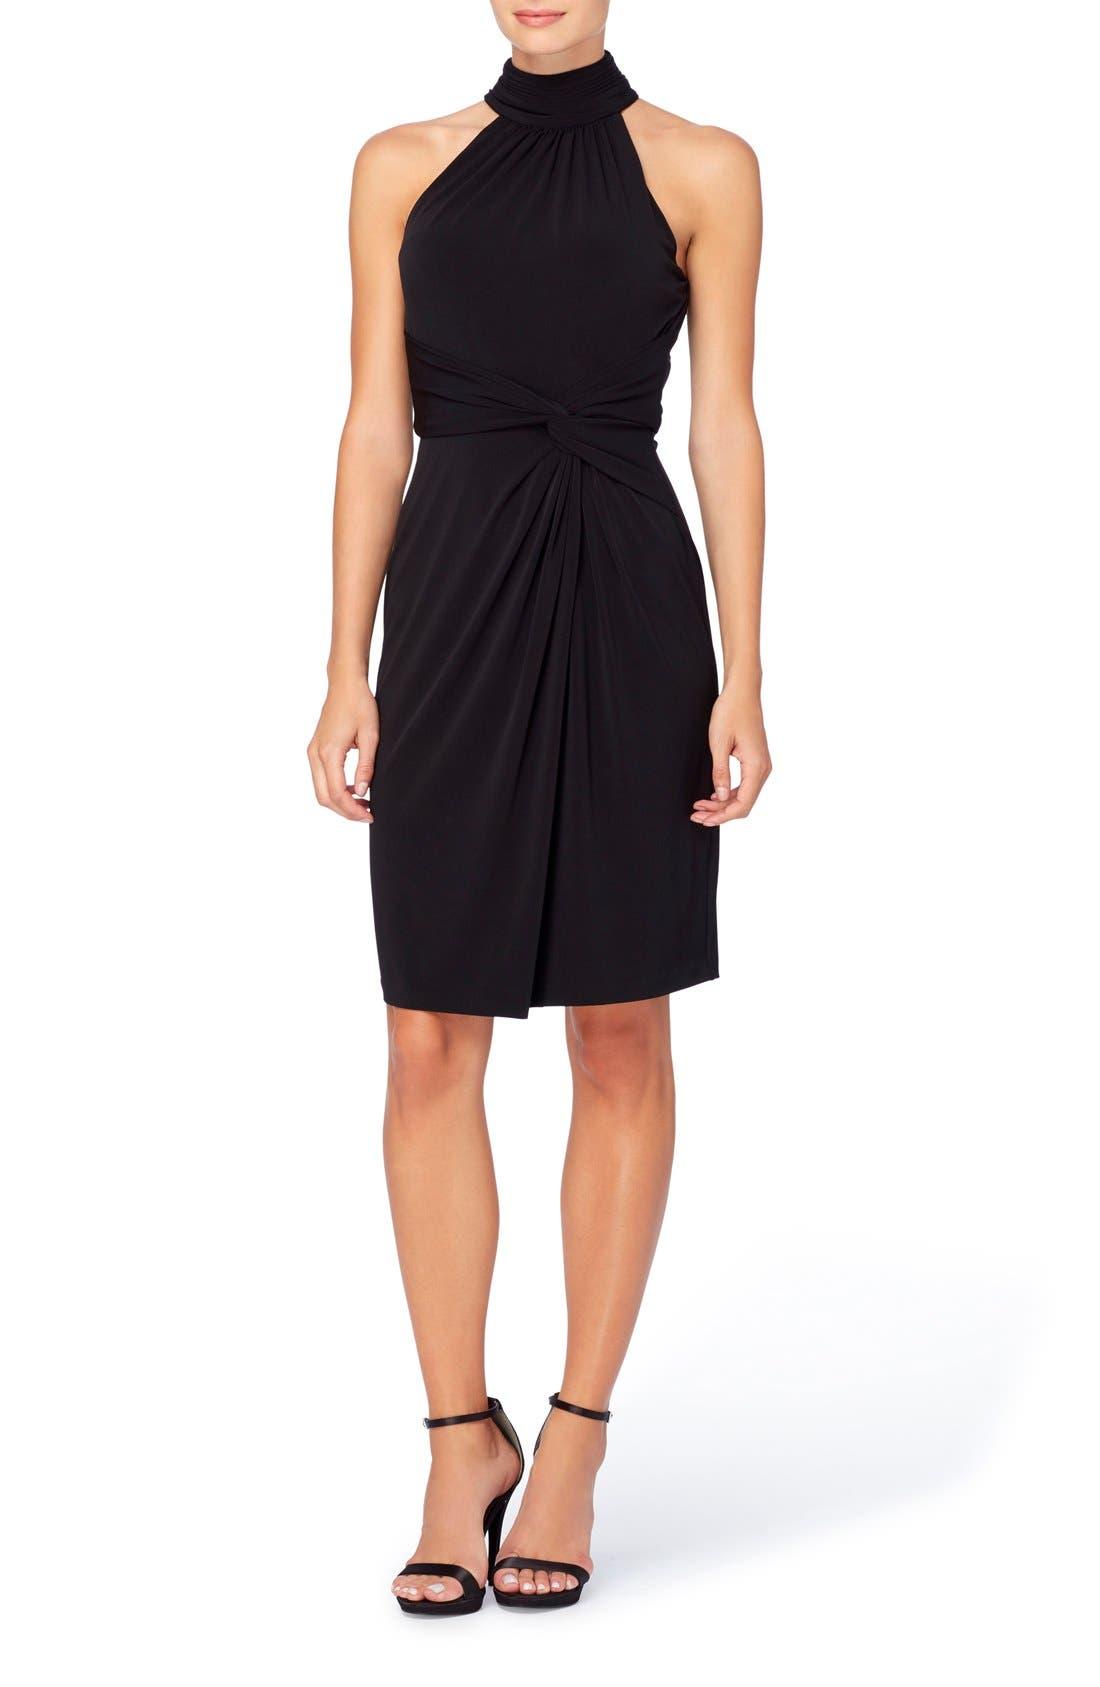 Jazz Halter Style Twist Front Dress,                         Main,                         color, 001